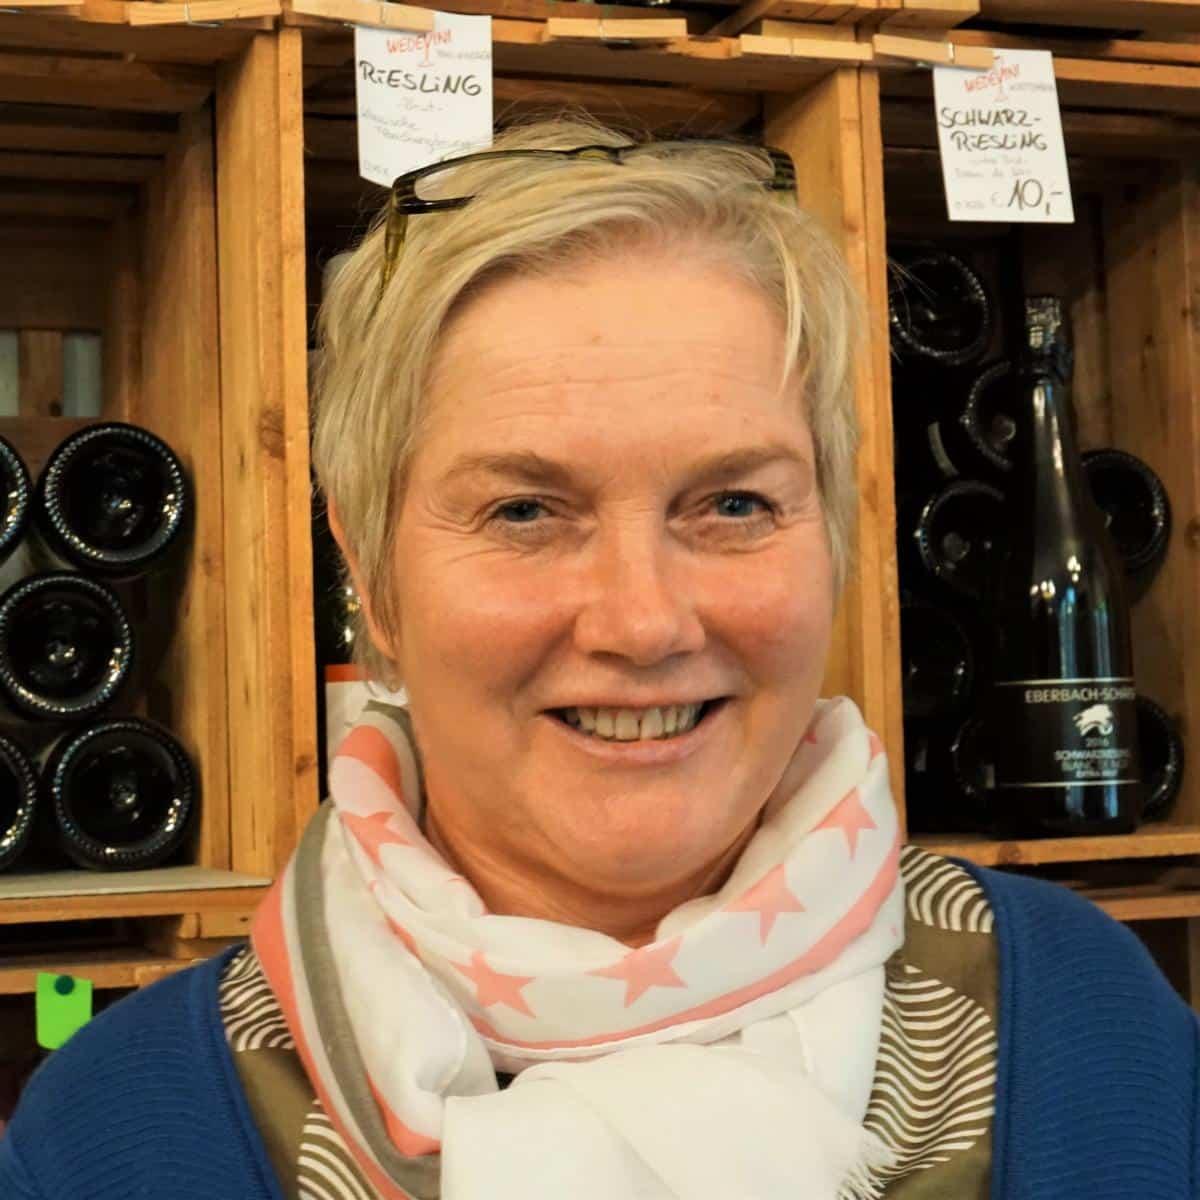 Style Hannover Wedevini 4 - Wedevini: So geht Wein richtig ...